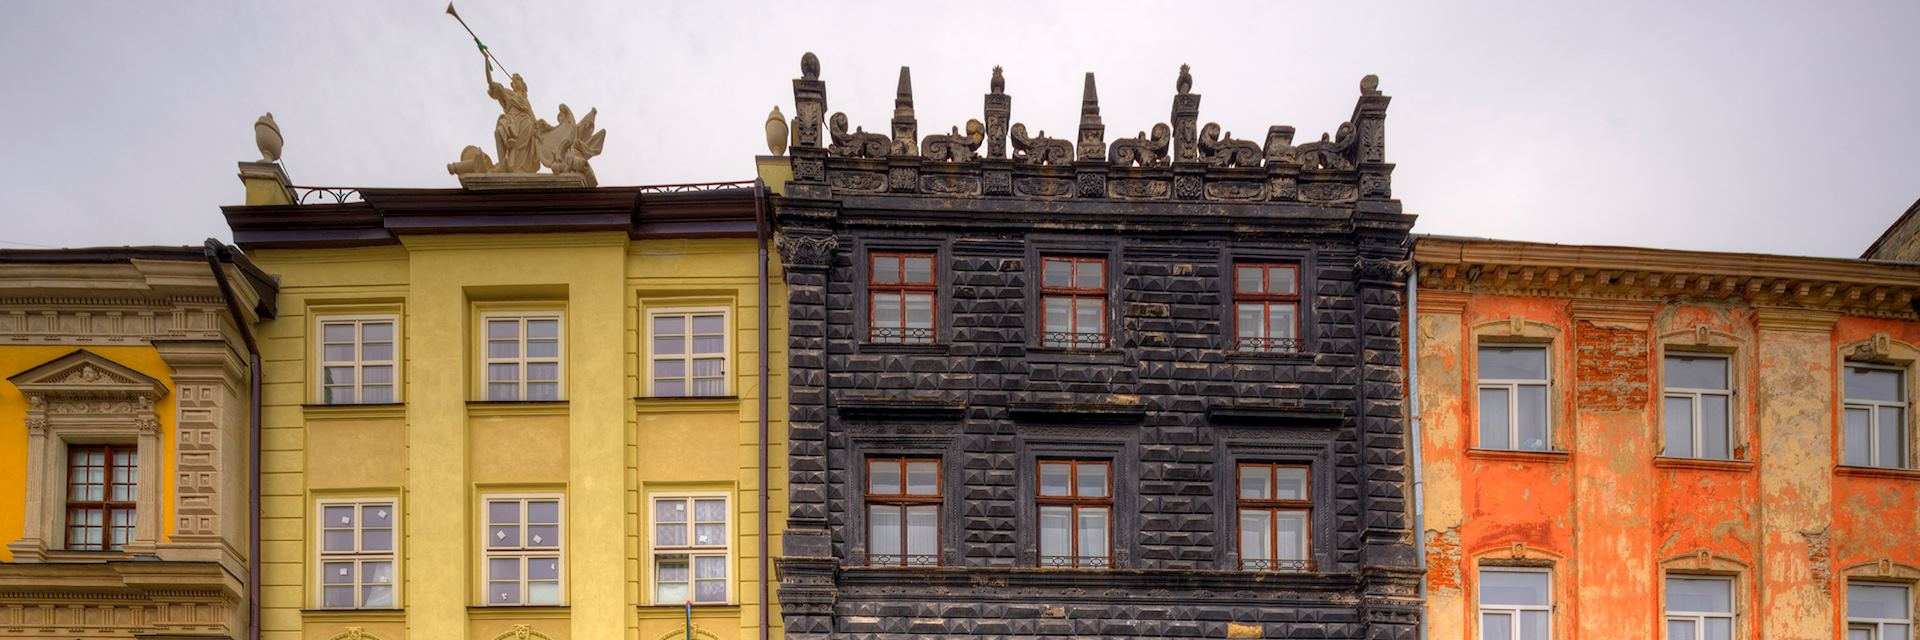 Architecture of Ivov